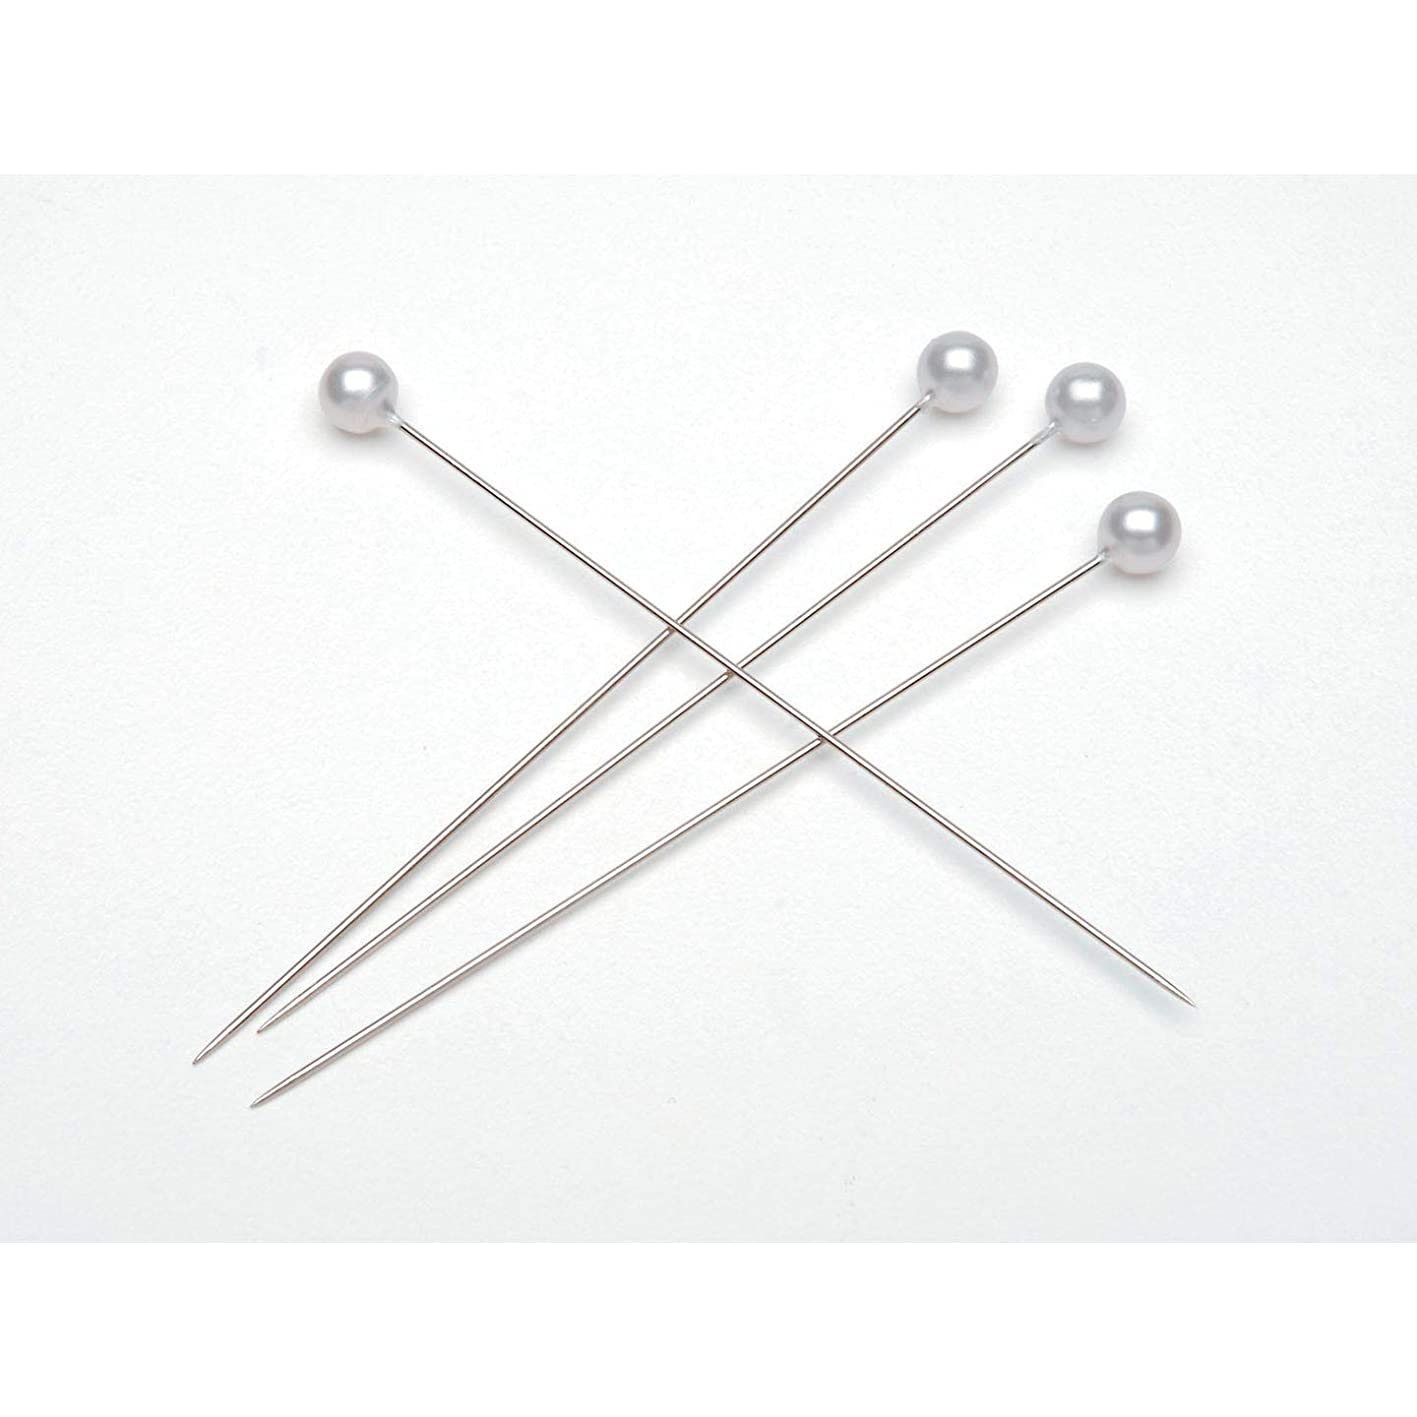 Bulk Buy: Darice DIY Crafts Pearl Flower Pins White 3 inches (144 pieces (3-Pack) 38075 ywltxmkmedd332